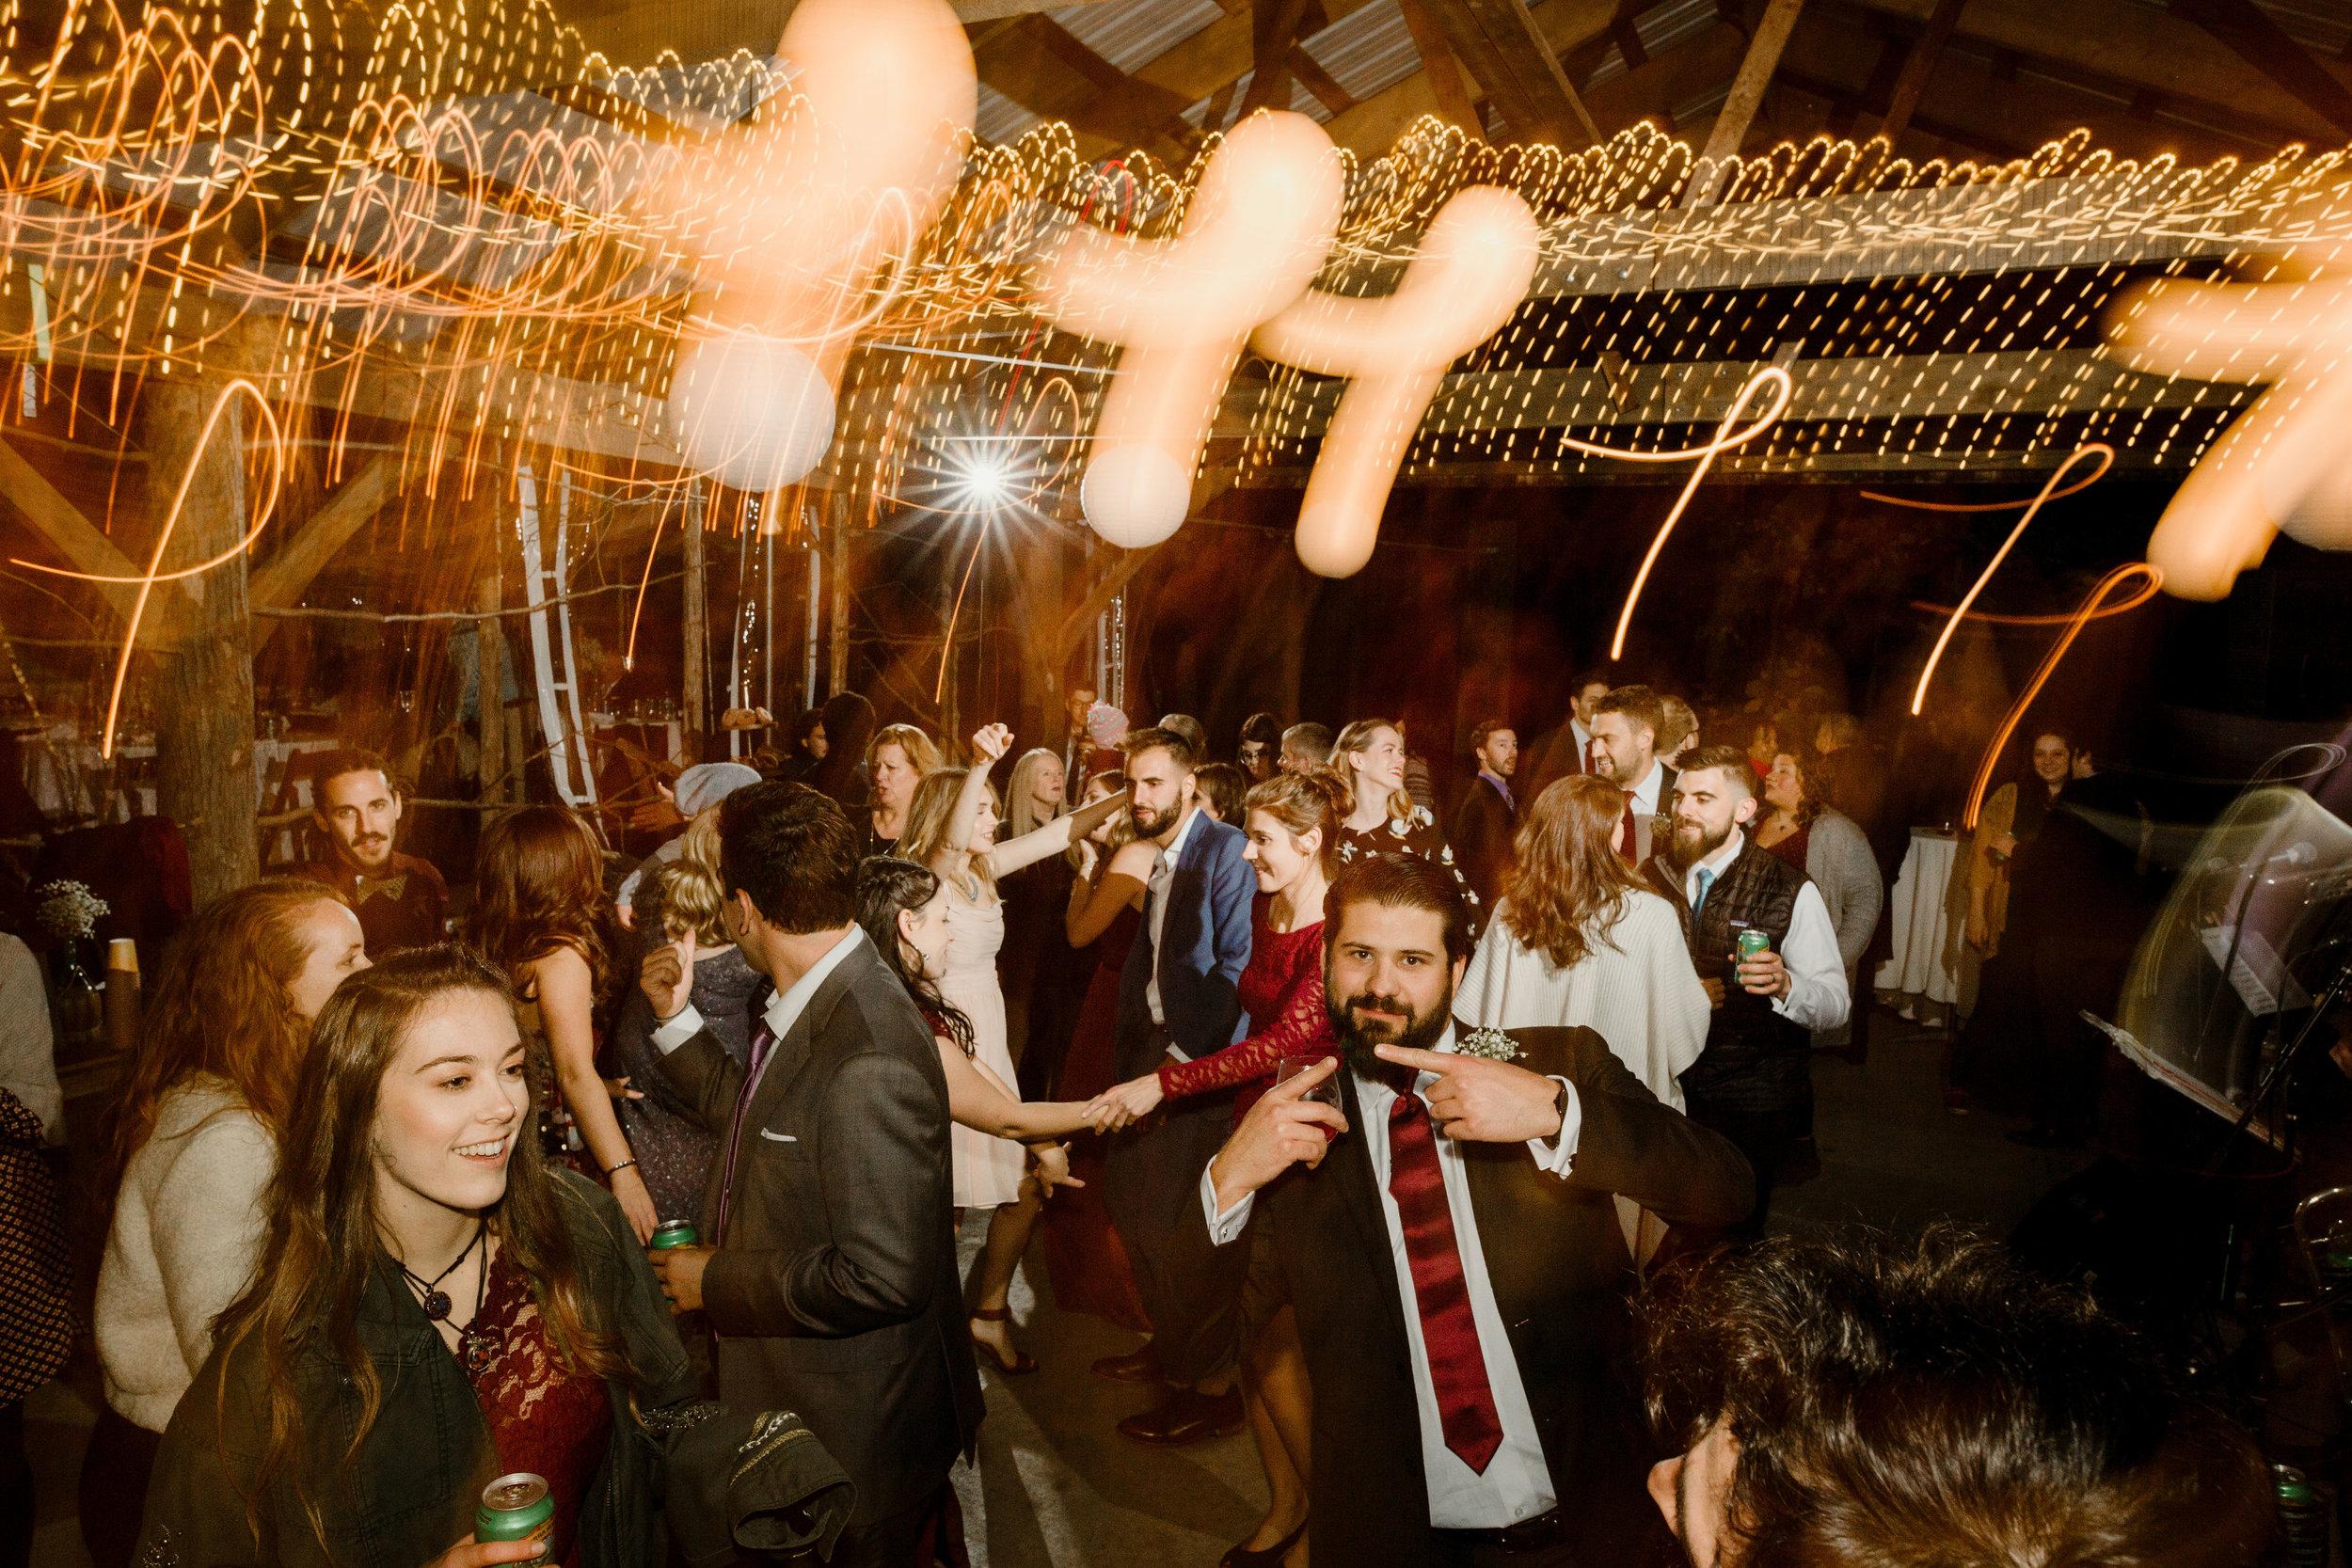 young-love-media-rustic-fall-autumn-wedding-emmerich-tree-farm-hudson-valley-warwick-new-york-reception-332.jpg